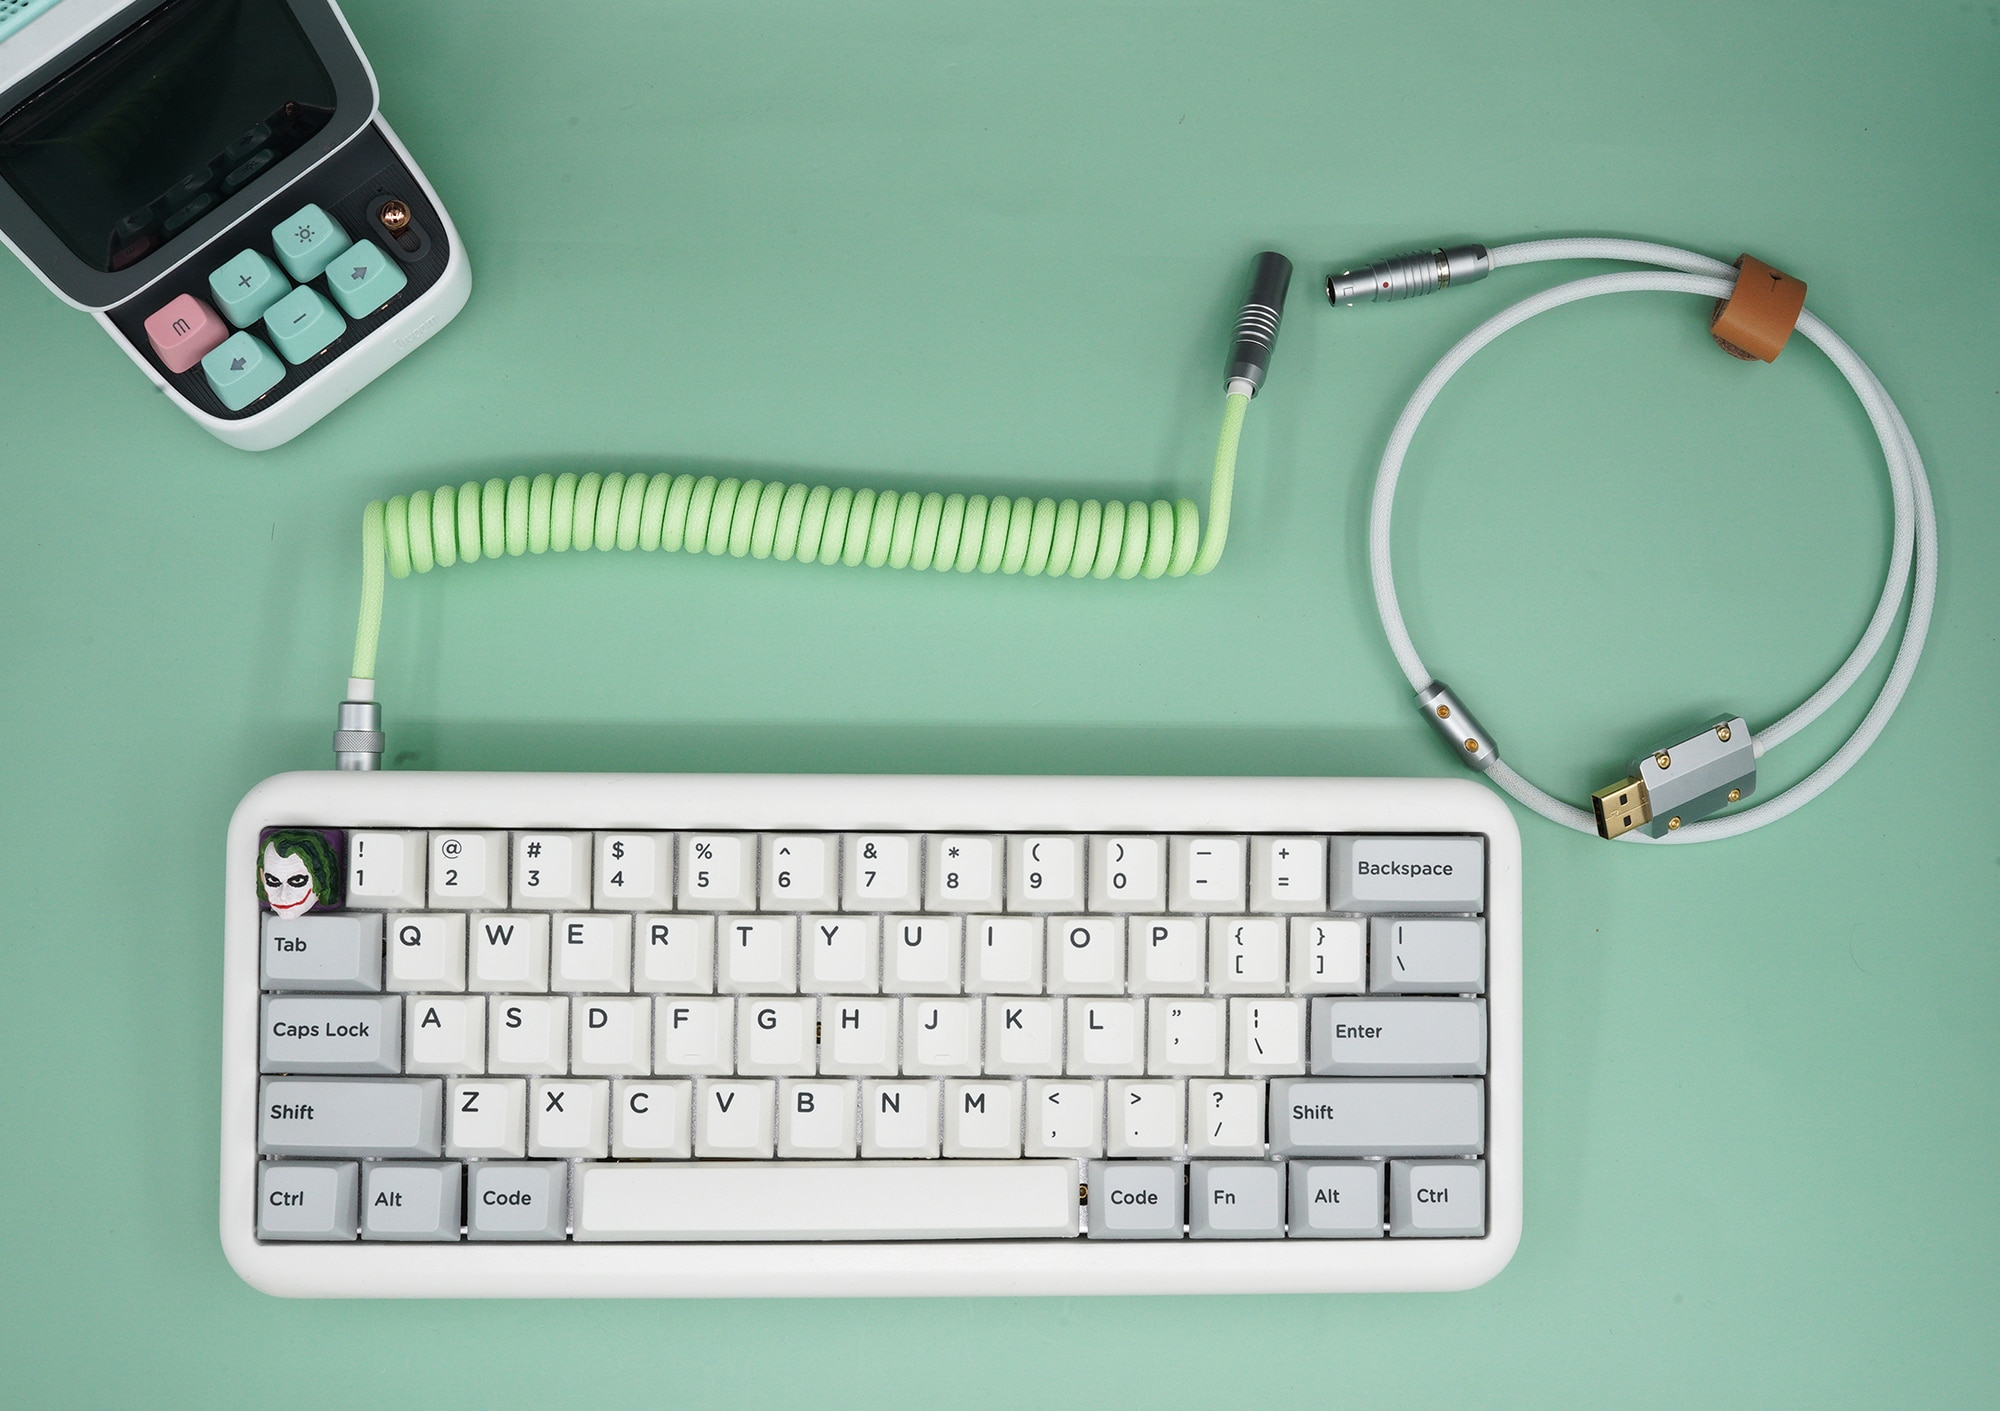 Geekكابل أخضر أبيض للوحة المفاتيح الميكانيكية يدوية الصنع مخصصة بيانات لوحة المفاتيح دوامة خط الطيران الخلفي المكونات ماتشا